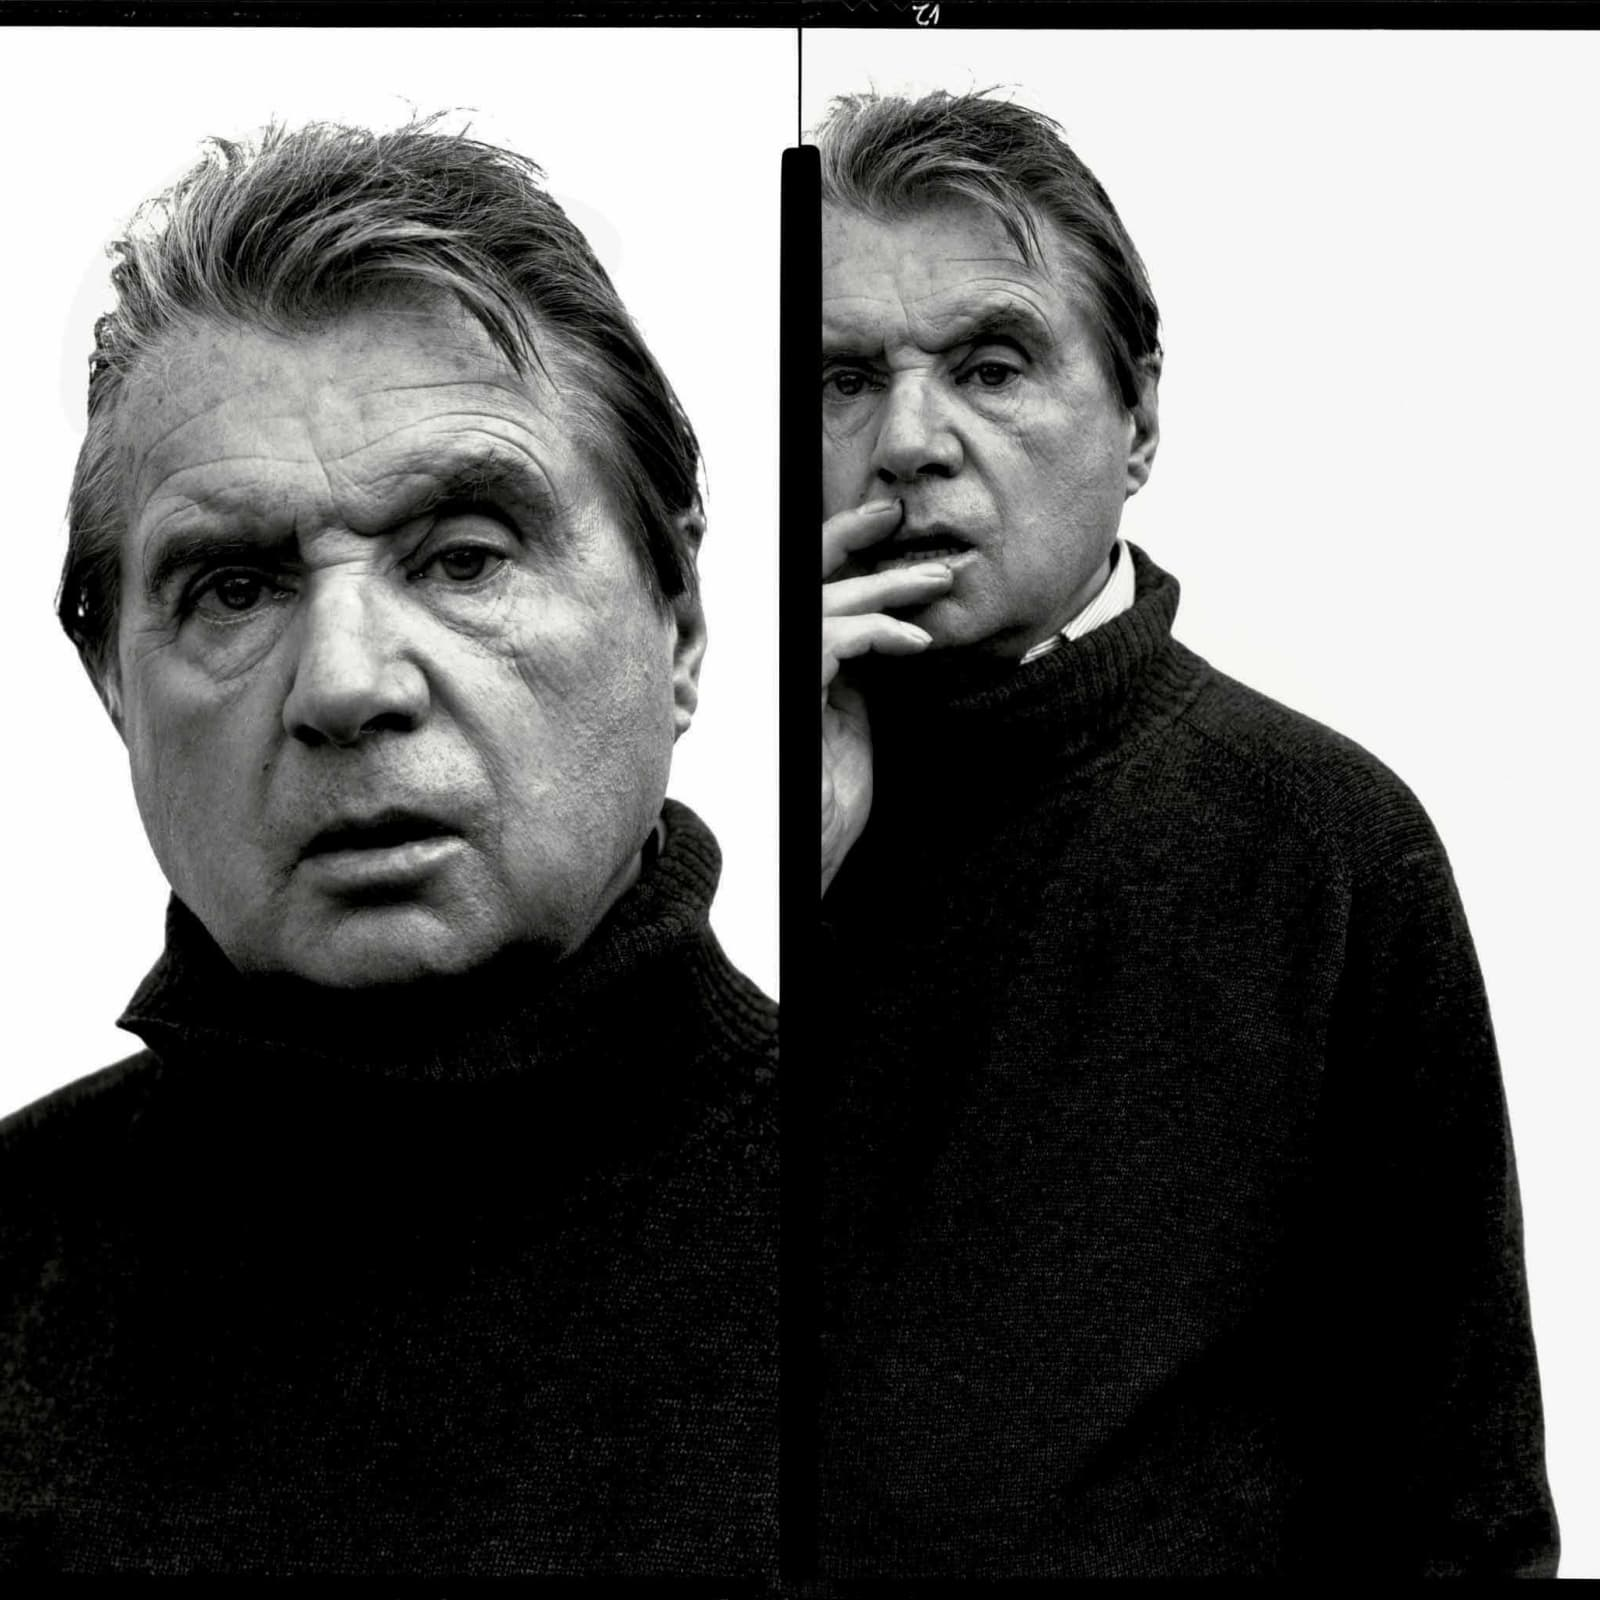 Francis Bacon by Richard Avedon, 1979